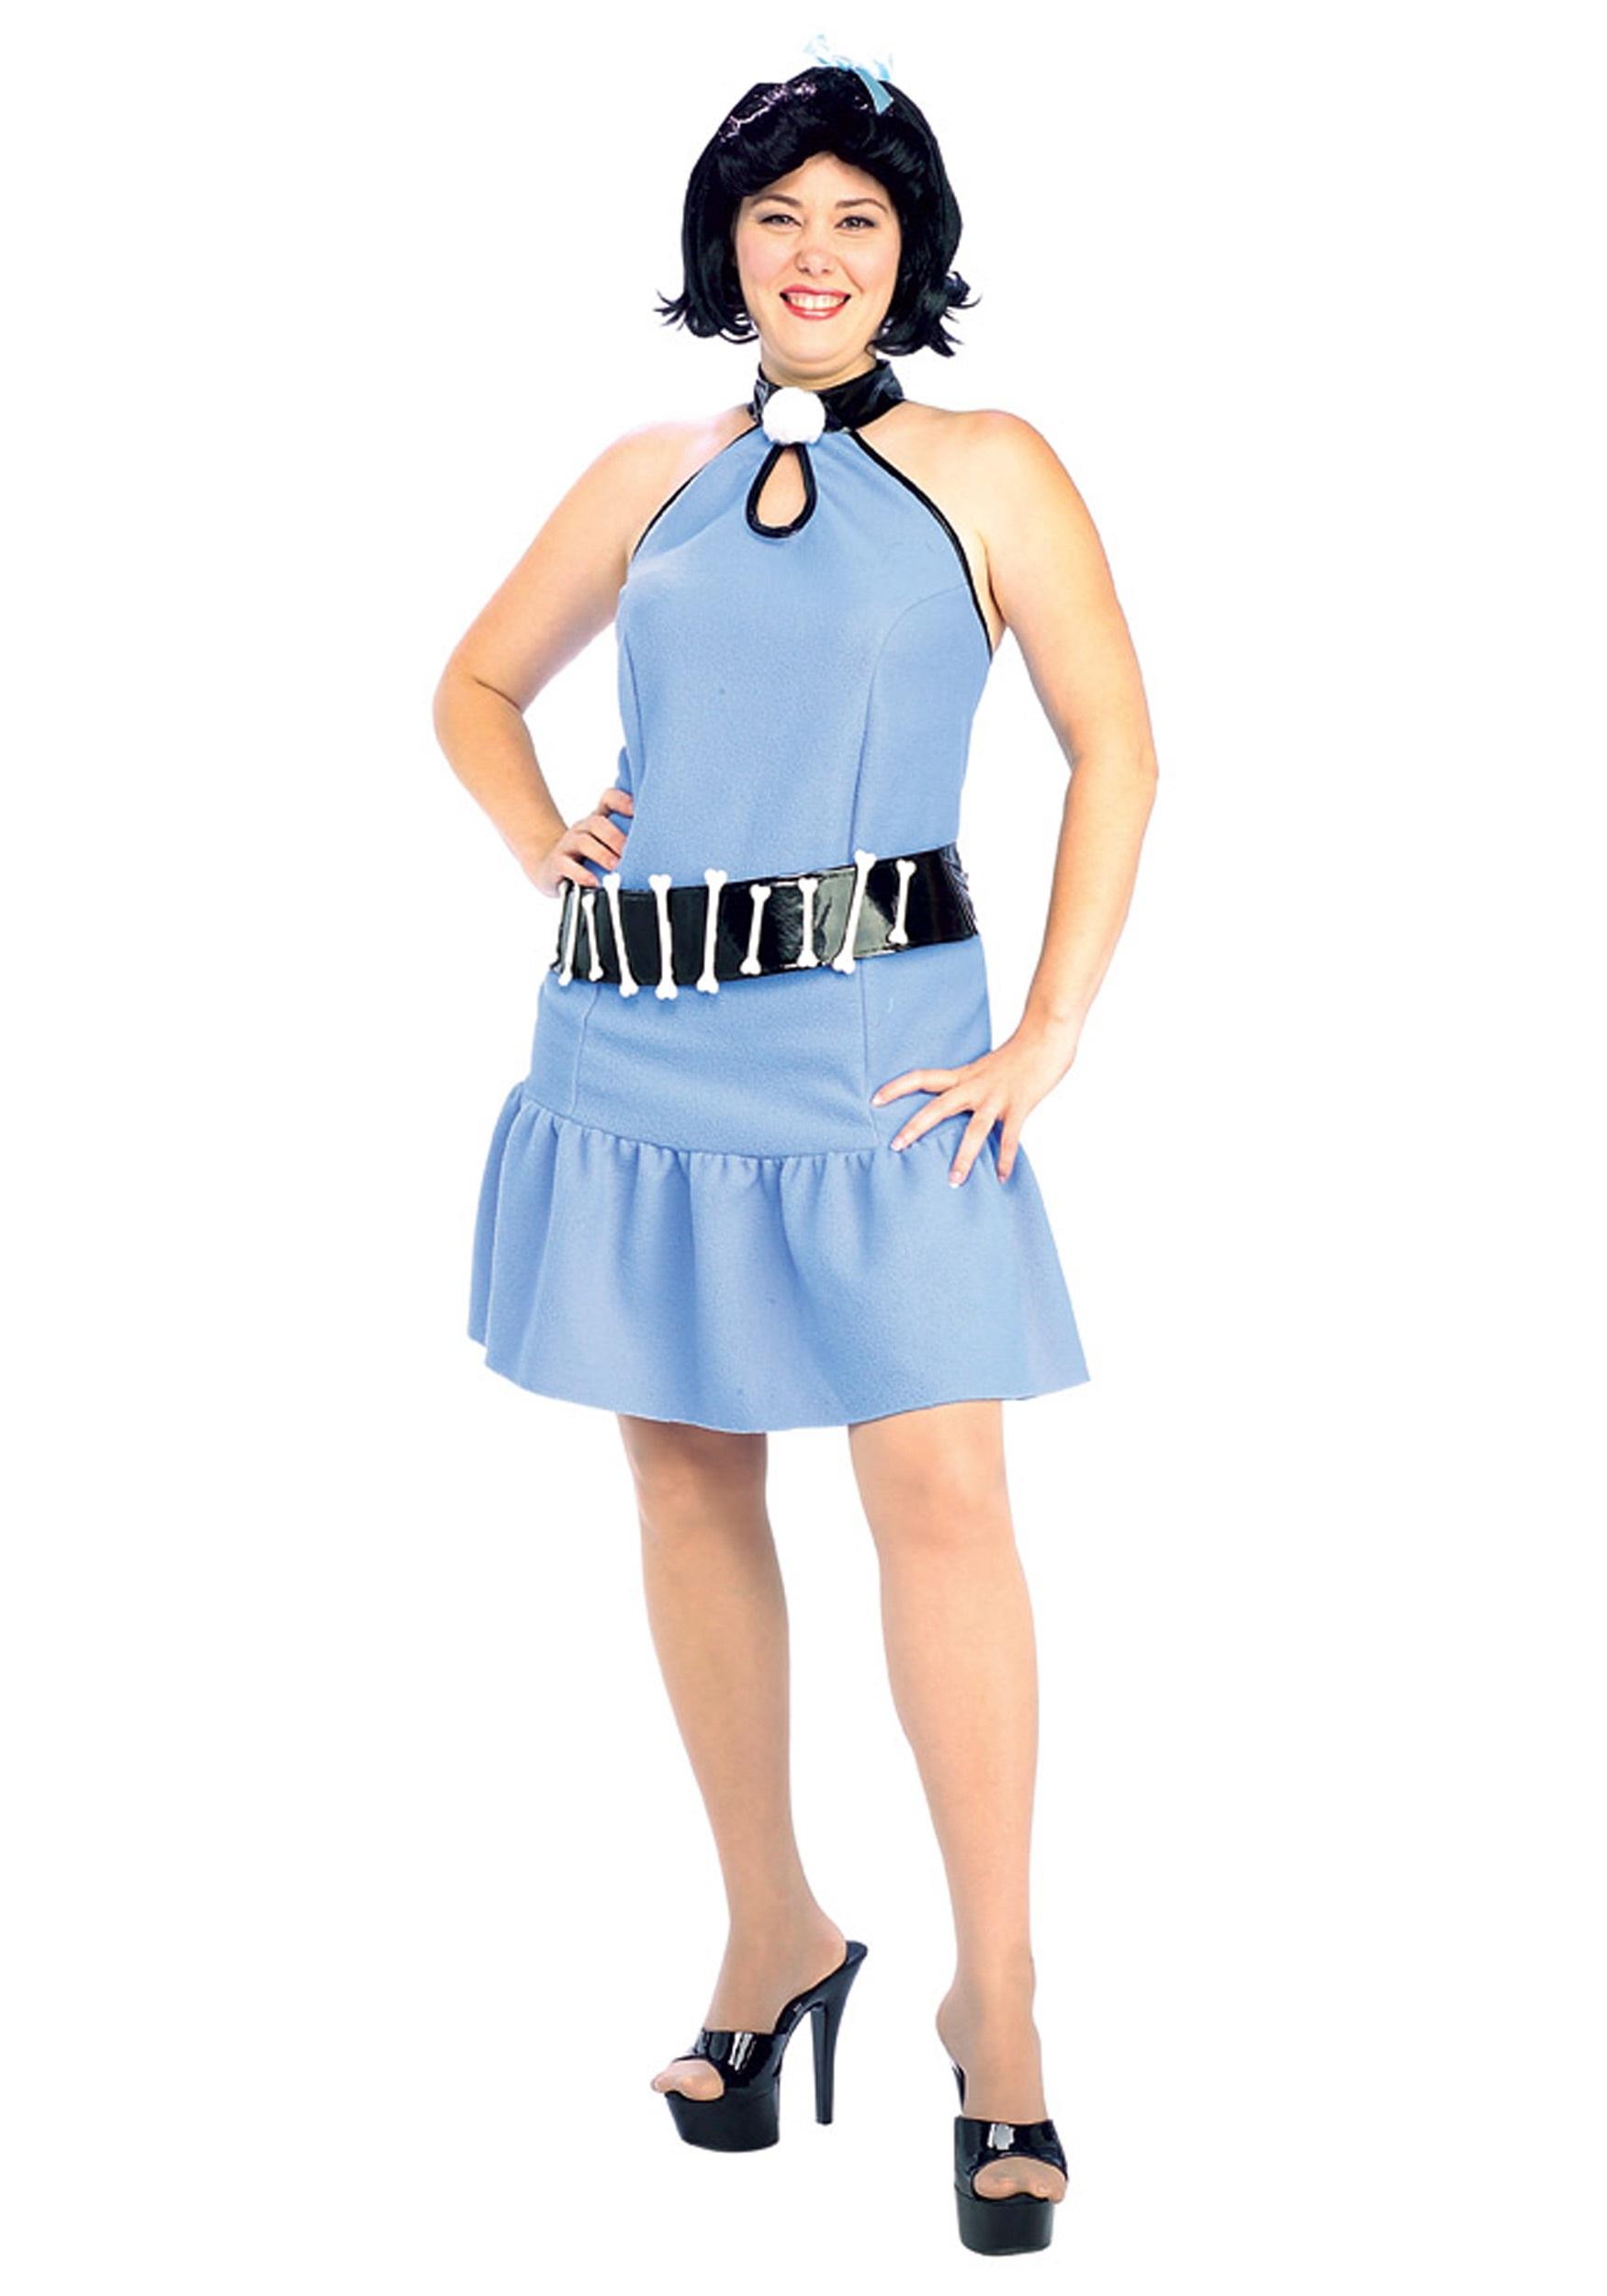 Remarkable, Adult flintstone costume